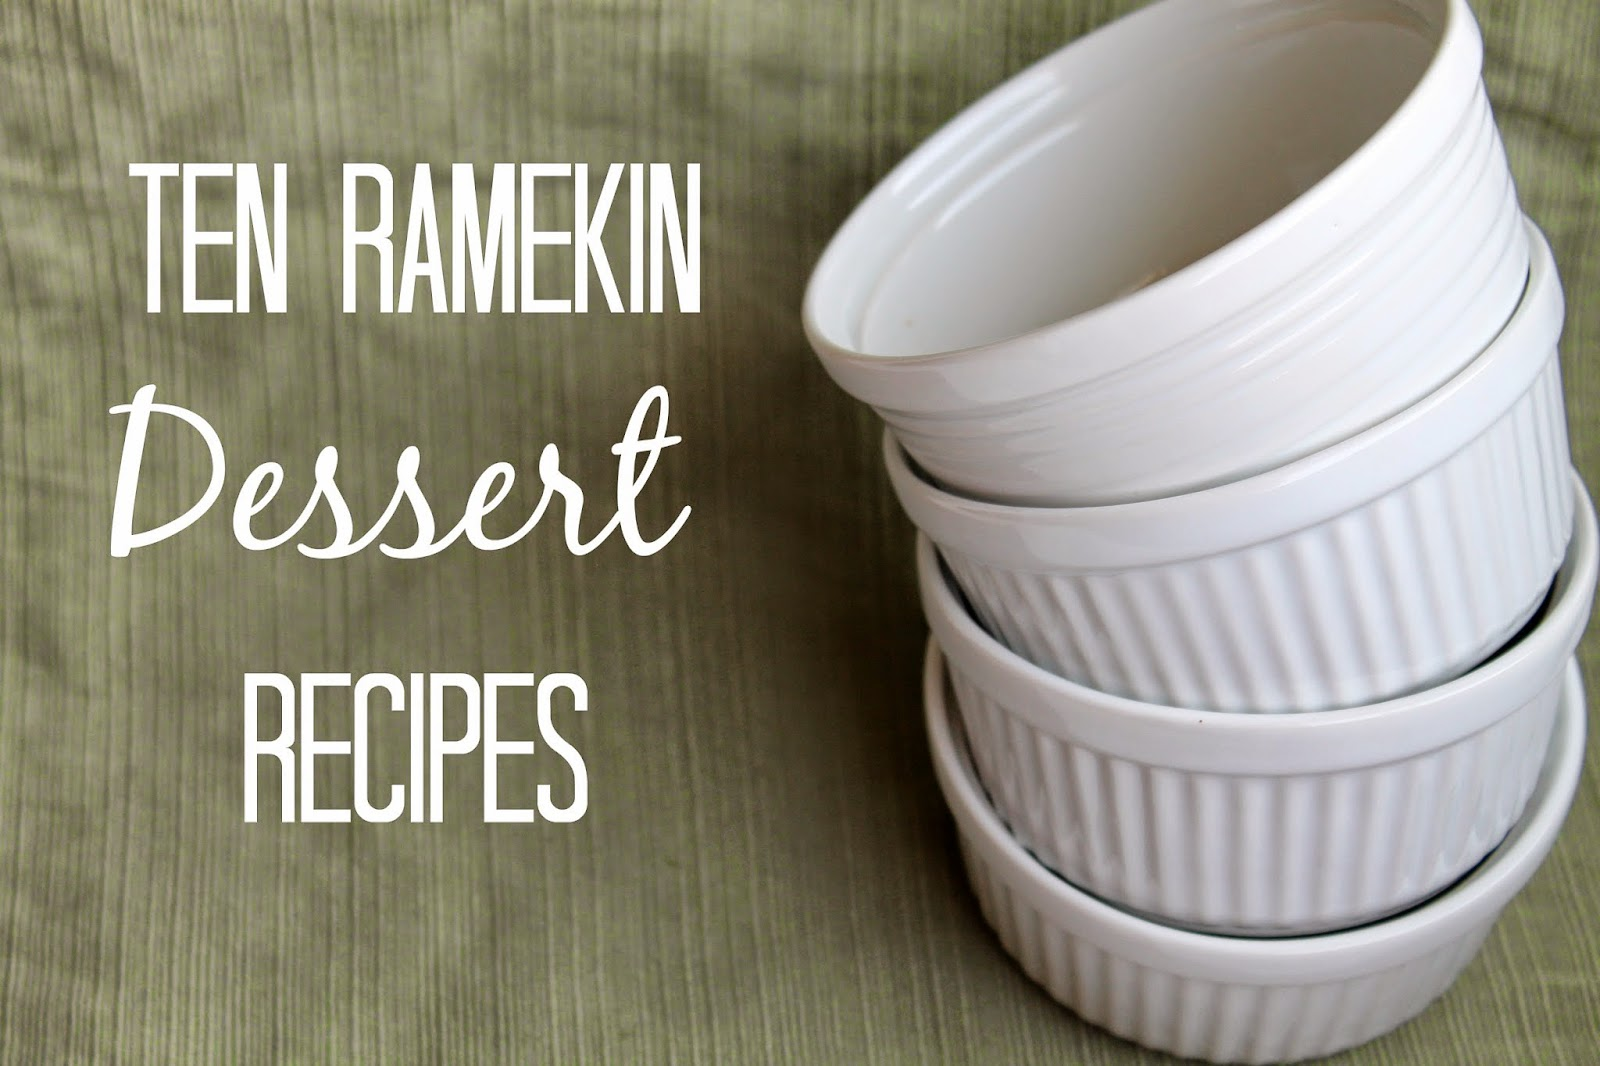 desserts for ramekins